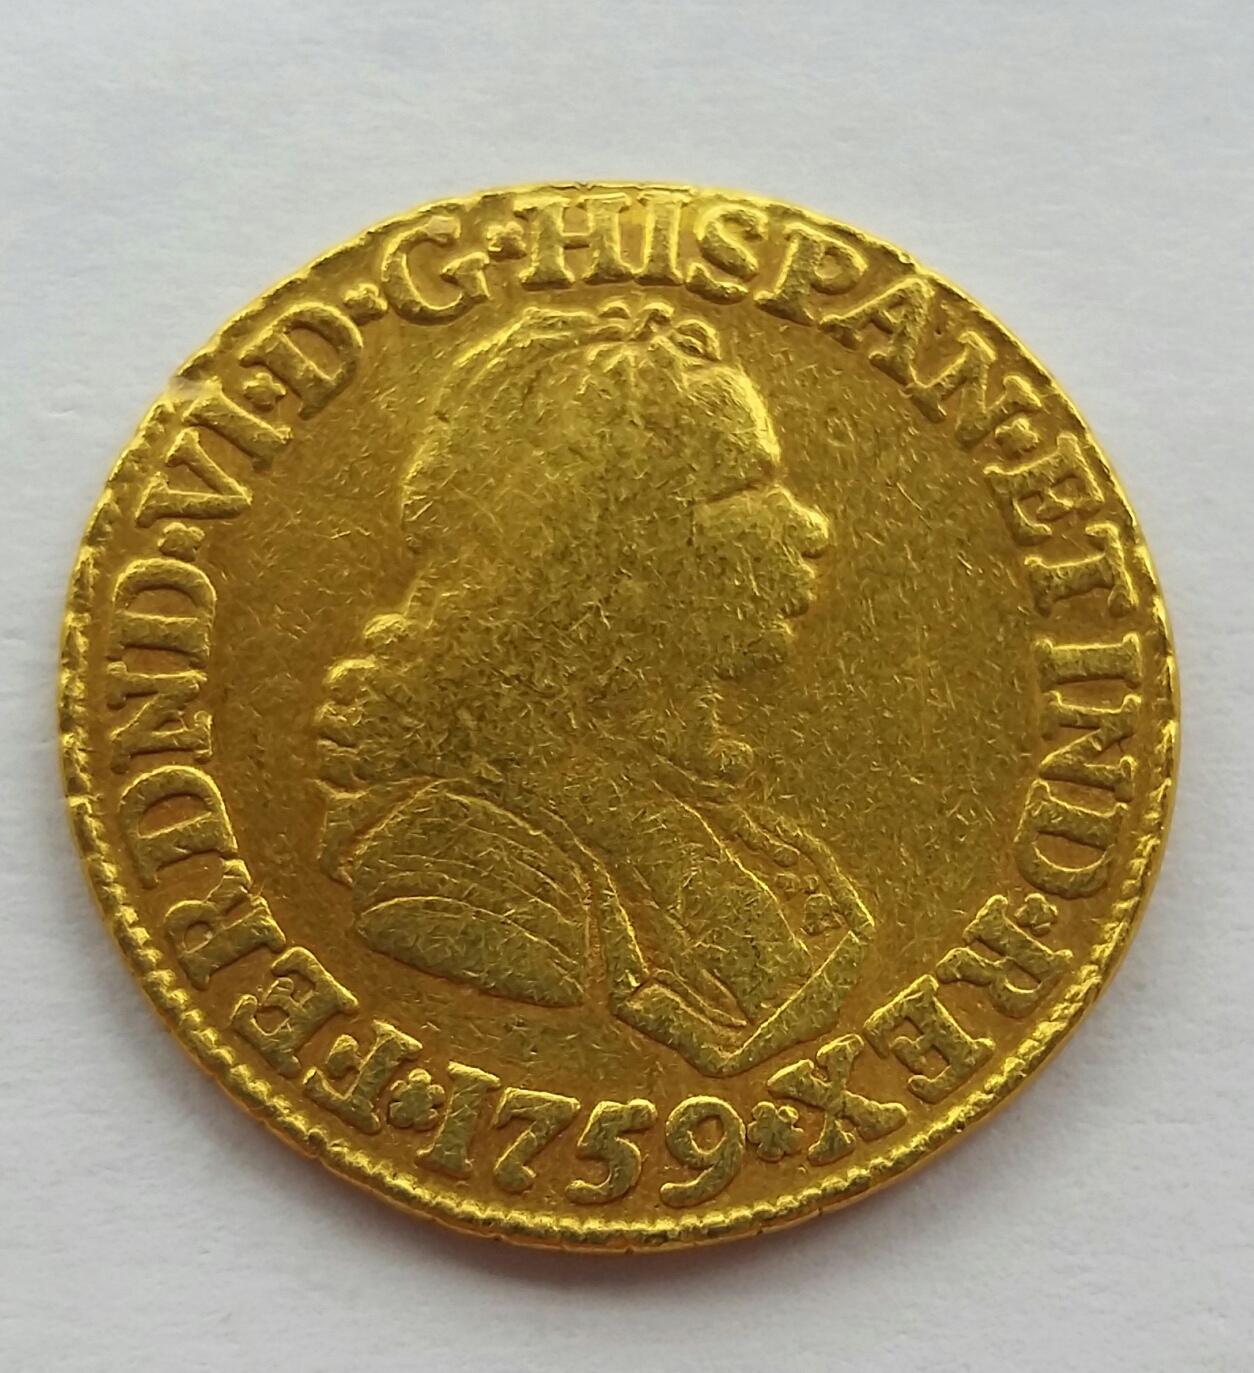 2 Escudos 1759 Santa Fe de Nuevo Reino J - Fernando VI 20191212